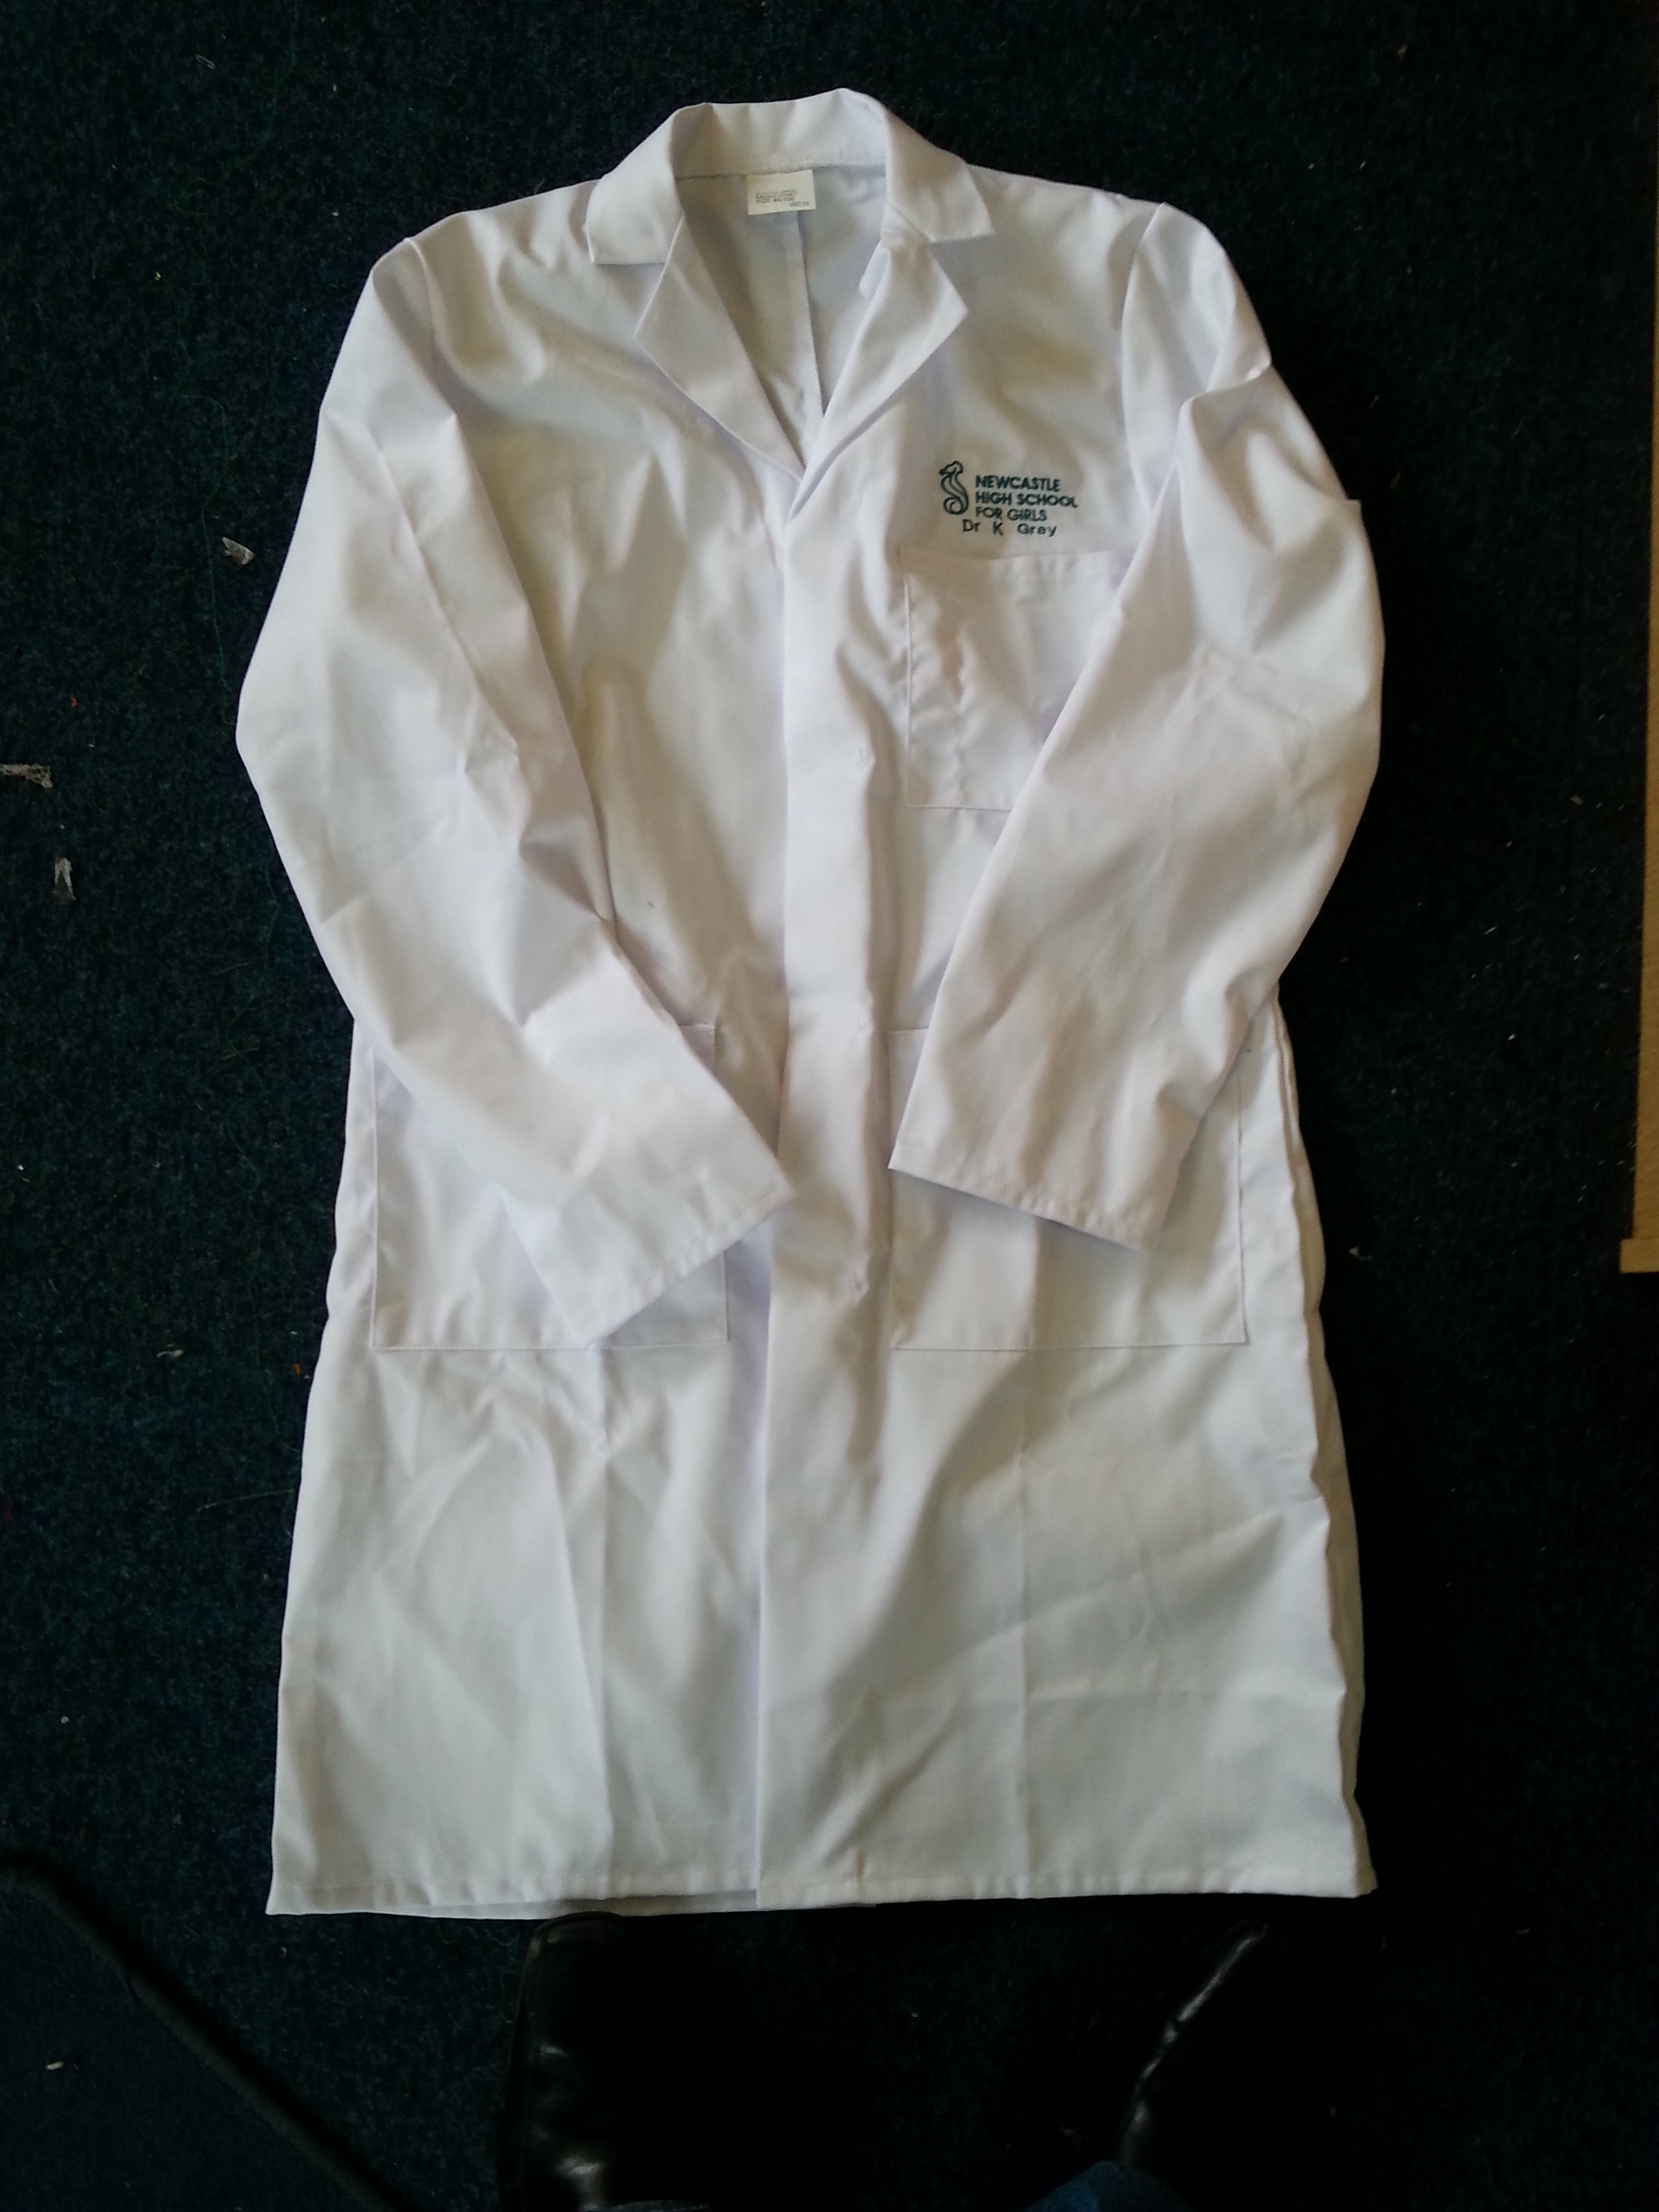 Embroidered Unisex Lab Coat ACWC1E